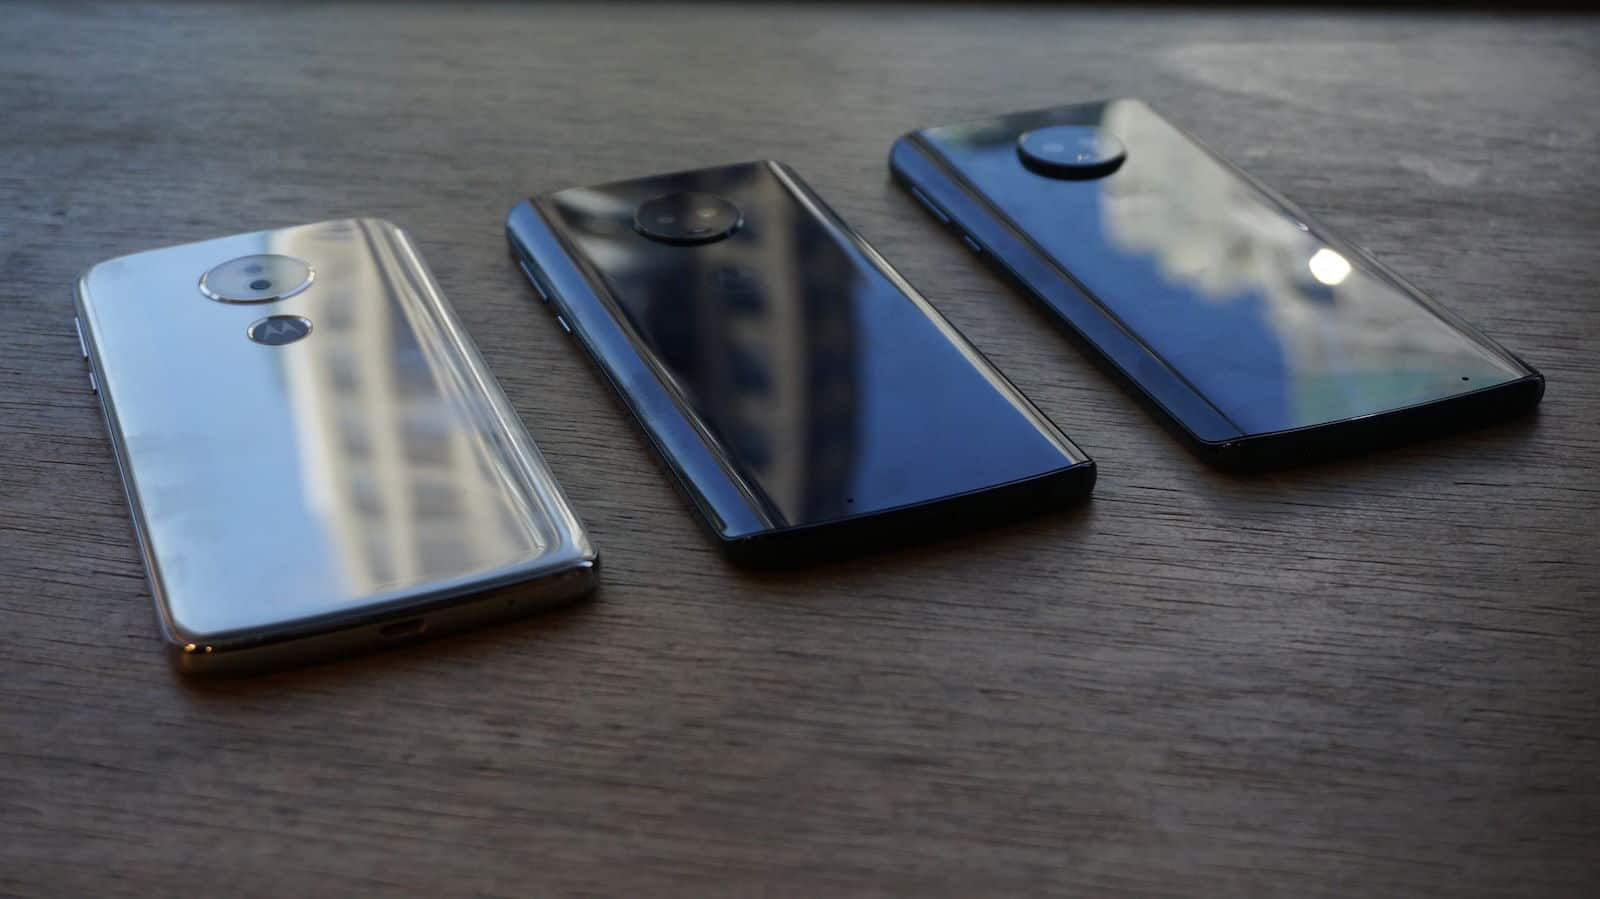 5c7d7664f Motorola  conheça os novos smartphones Moto G6